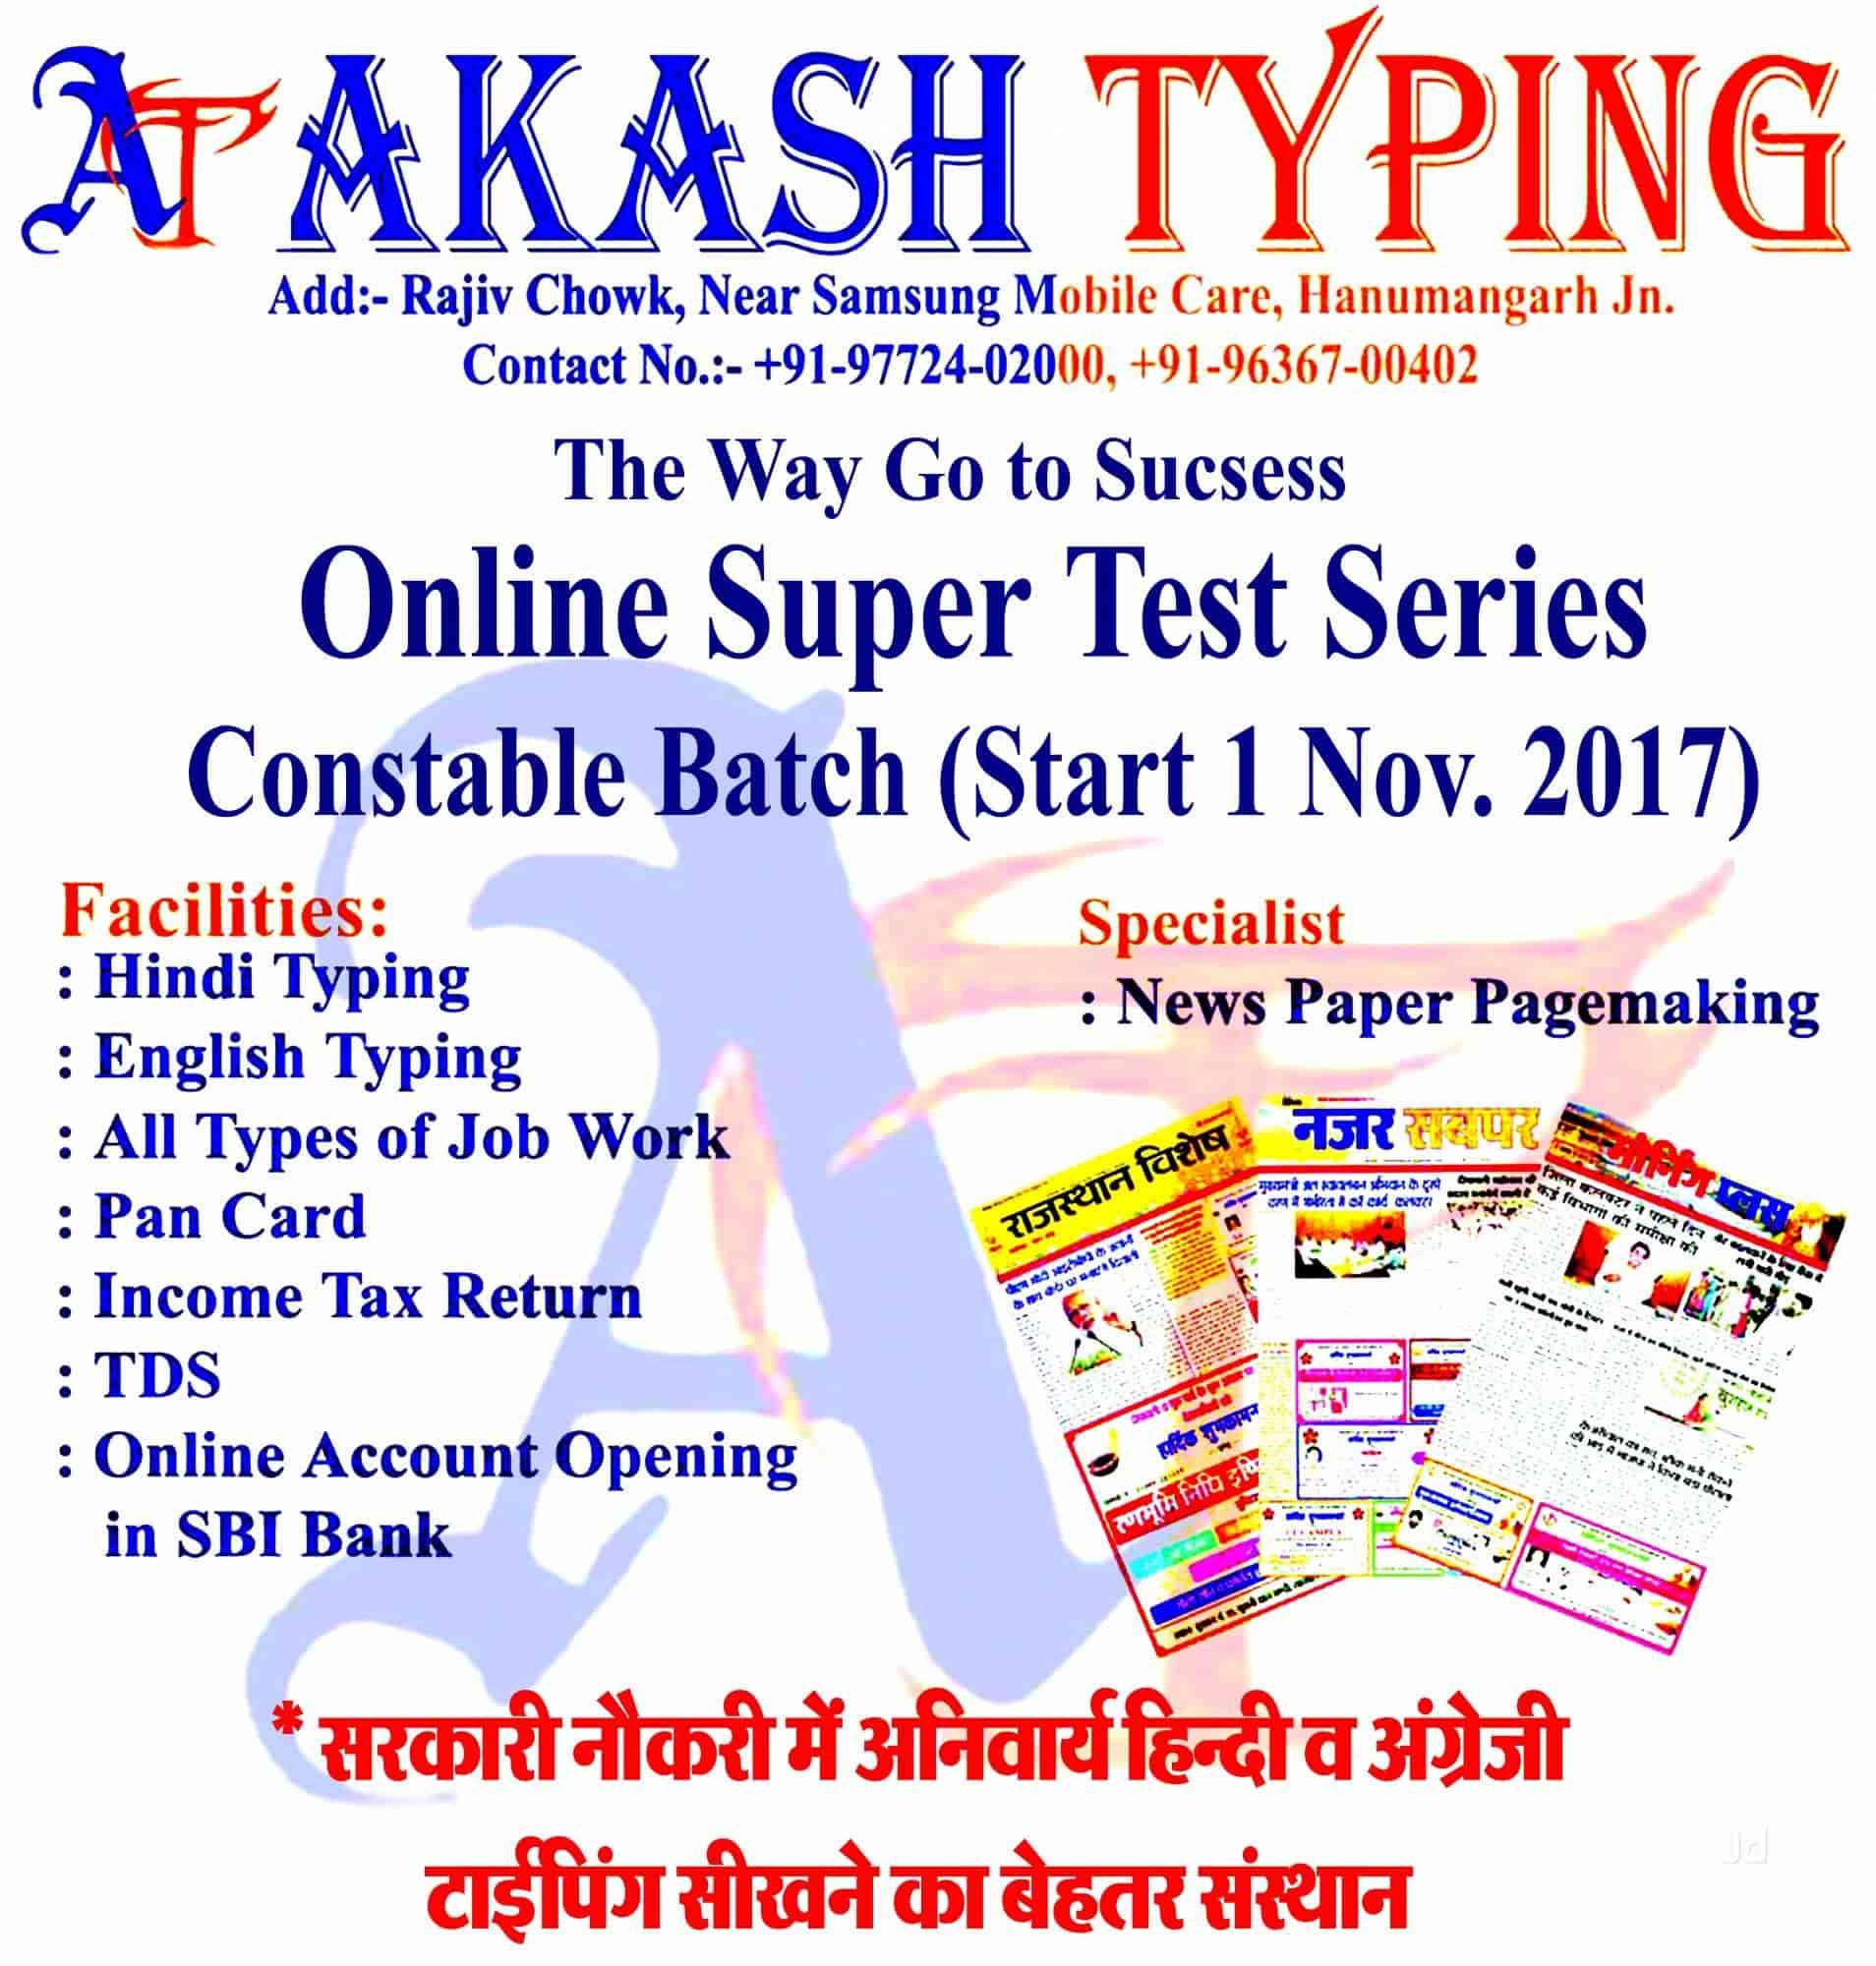 Akash Typing, Juntion Court - Typing Classes in Hanumangarh - Justdial